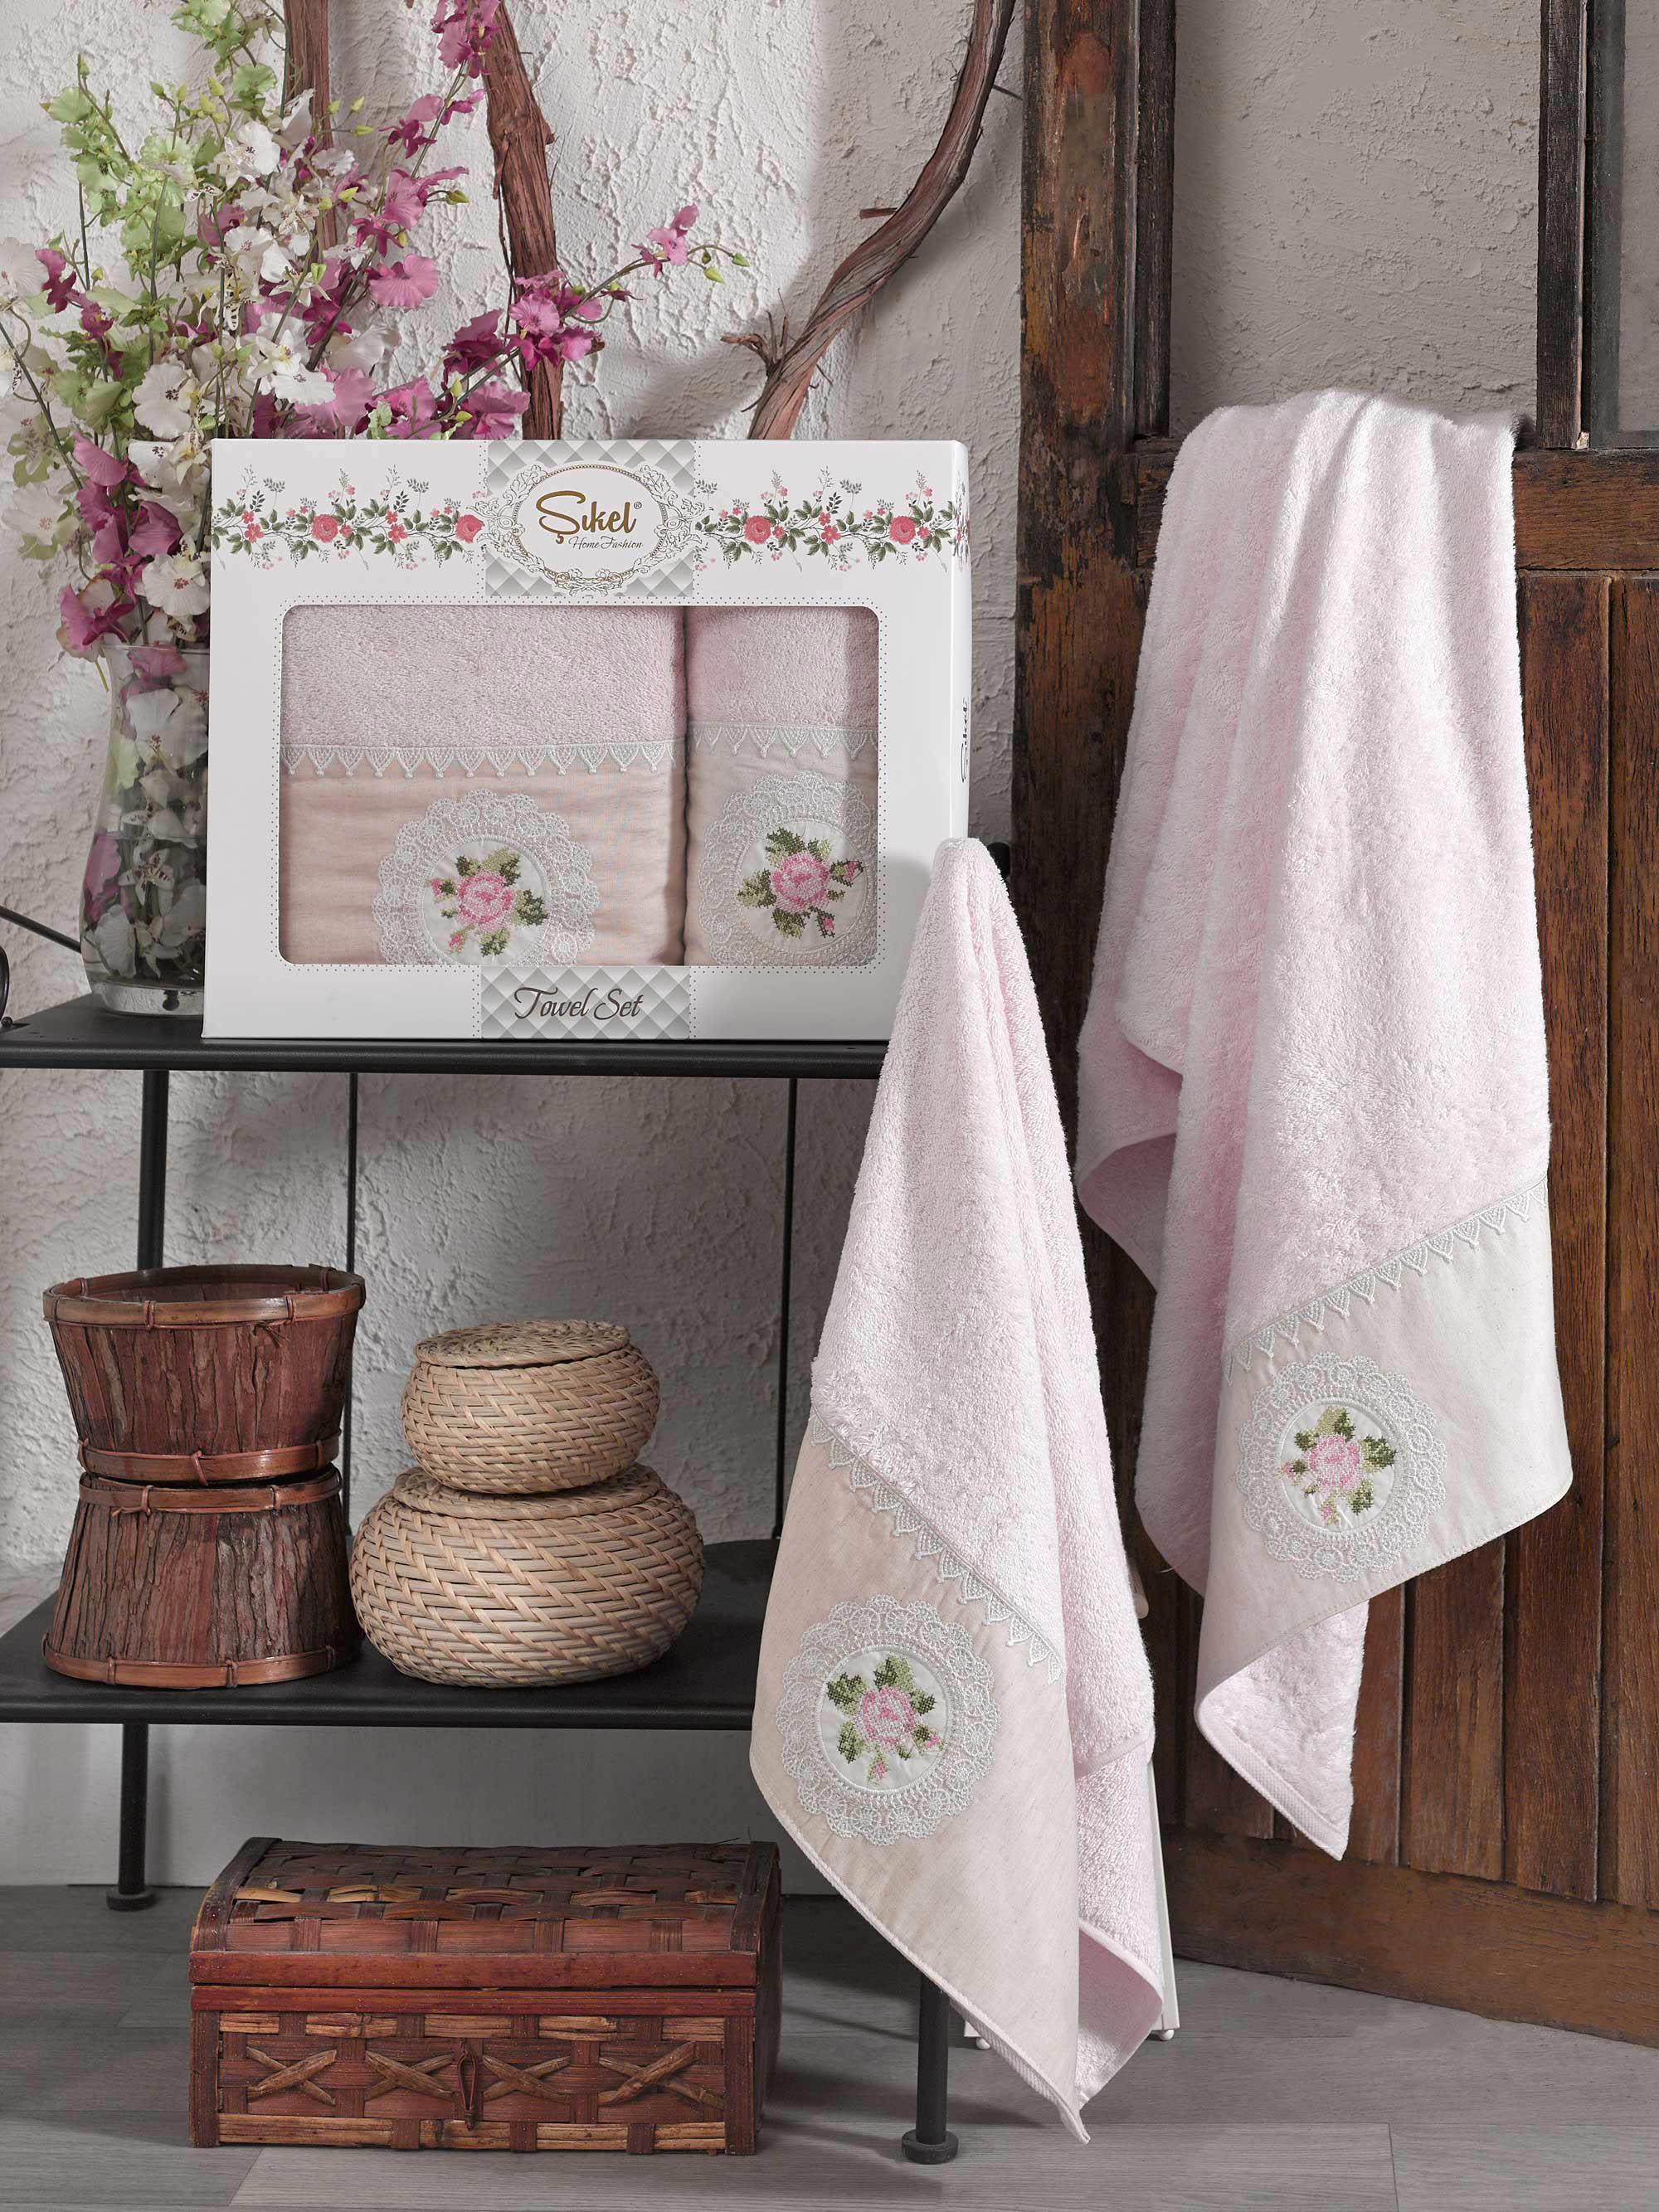 Полотенца Sikel Полотенце Kanevice Цвет: Персиковый (50х90 см,70х140 см) полотенца sikel полотенце kanevice цвет пудра 50х90 см 70х140 см